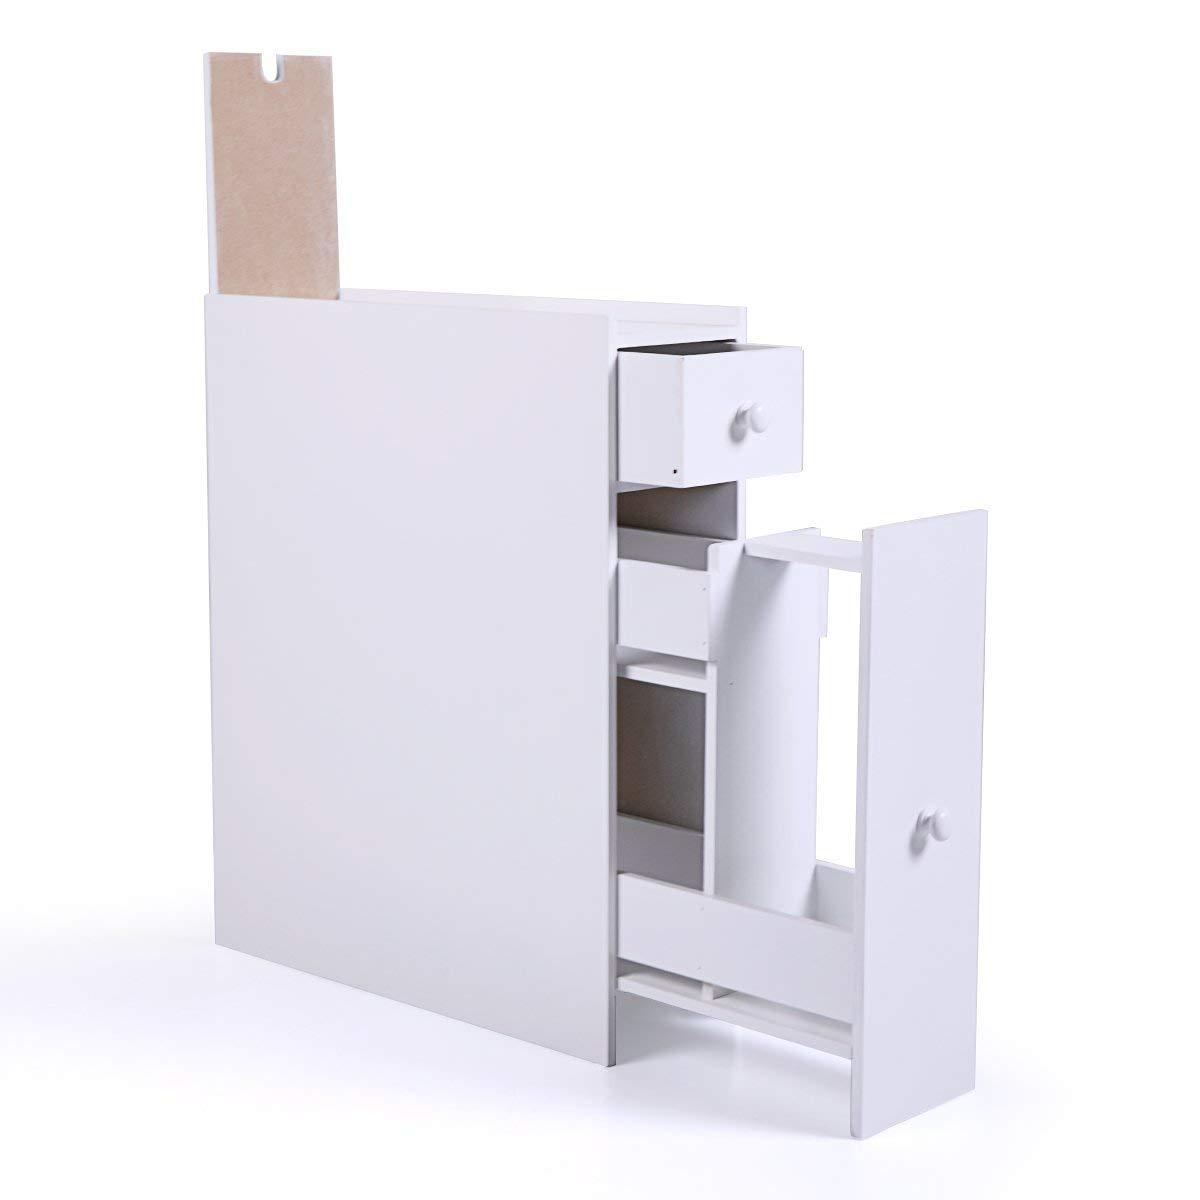 JAXPETY White Bathroom Floor Cabinet Organizer Bath Toilet Cabinets Drawers Stand Space Saver Storage